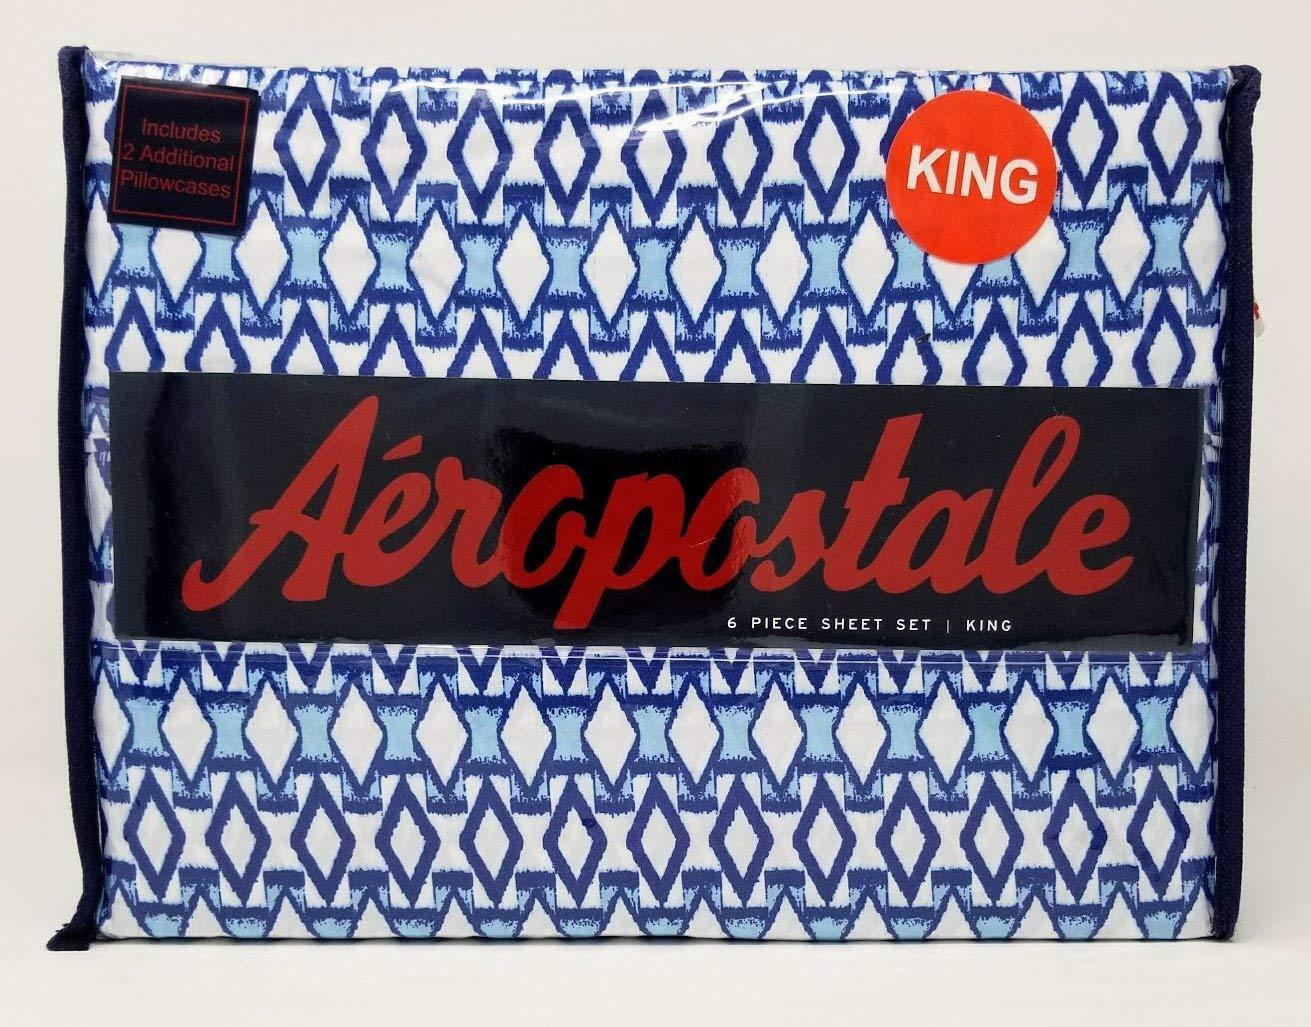 Aeropostale 6pc King Sheet Set Ikat Diamond in Navy, Turquoise, and bianca